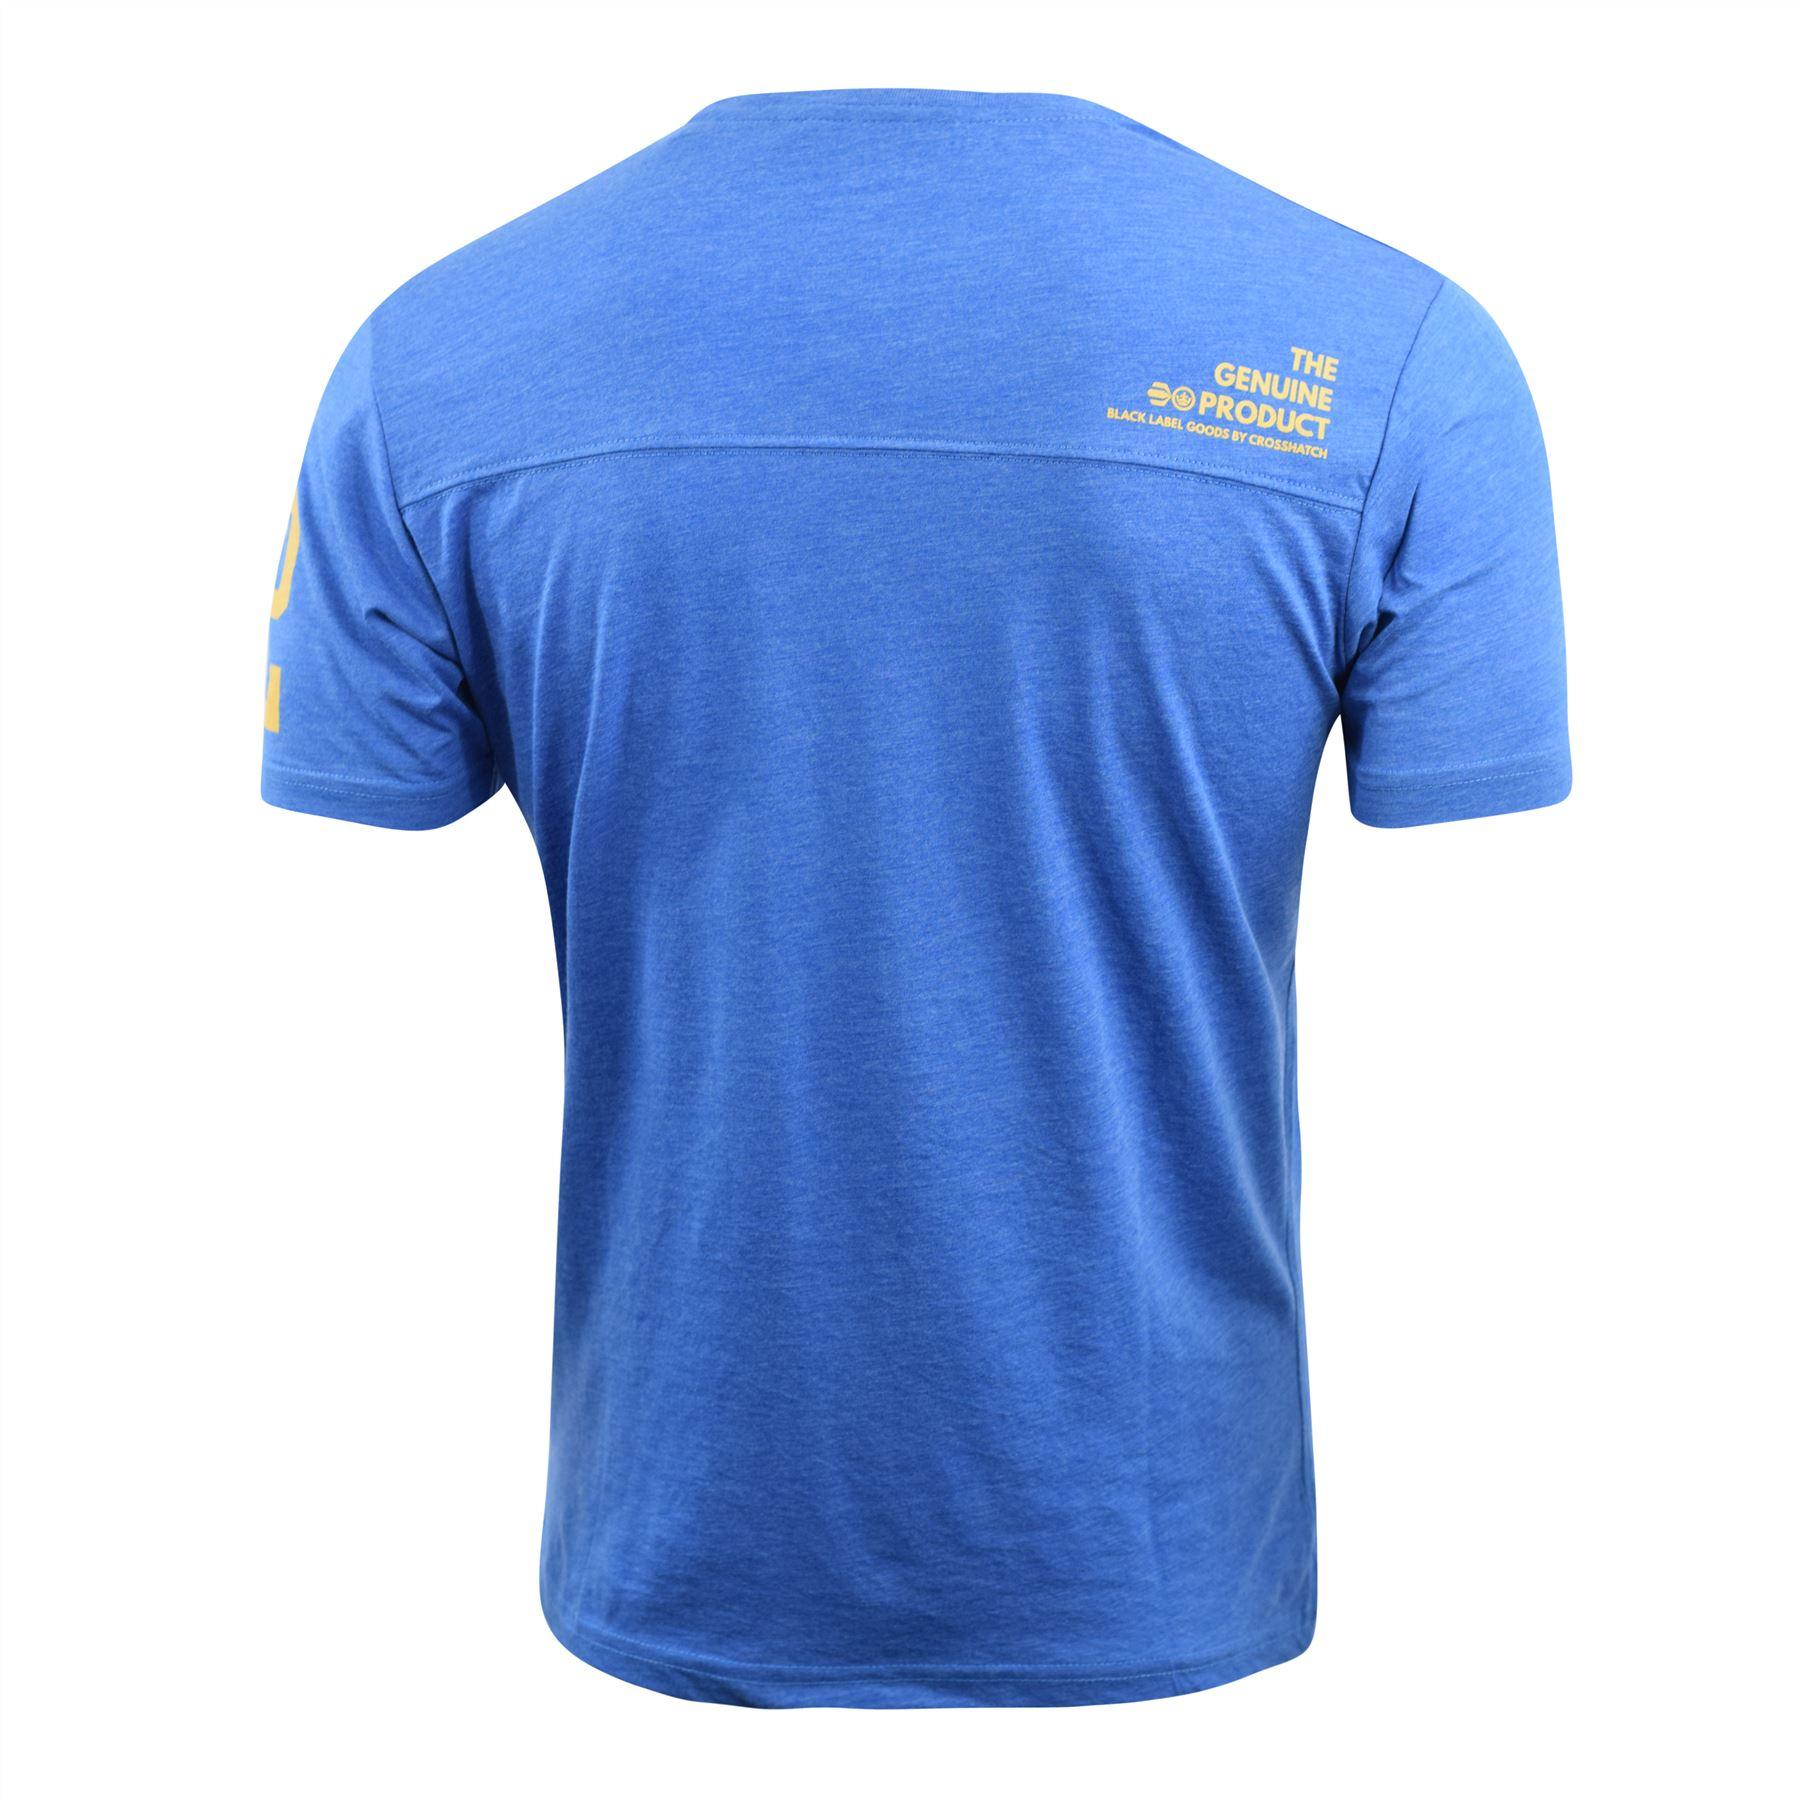 Mens-Crosshatch-T-Shirt-Contrast-Short-Sleeve-Tee-Top-Penycoat thumbnail 4